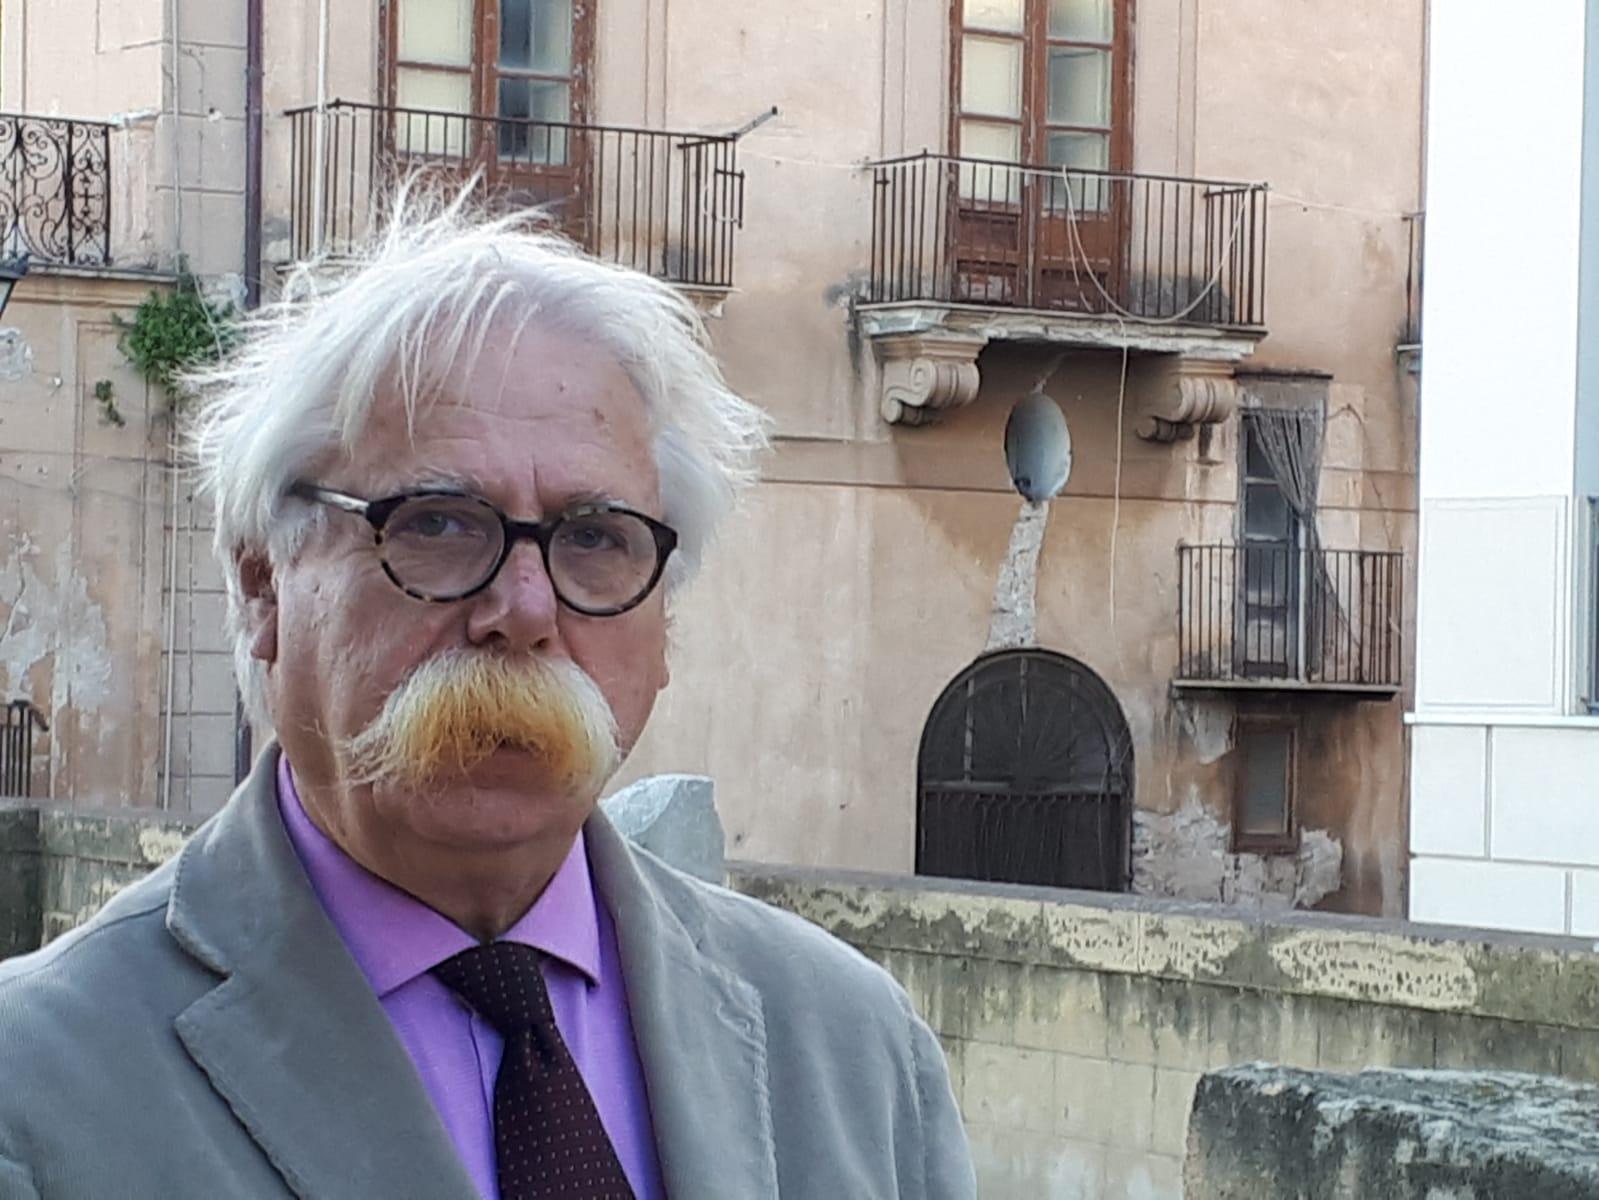 L'ex Sindaco di Mazara Nicola Cristaldi consigliere comunale a Calatafimi Segesta